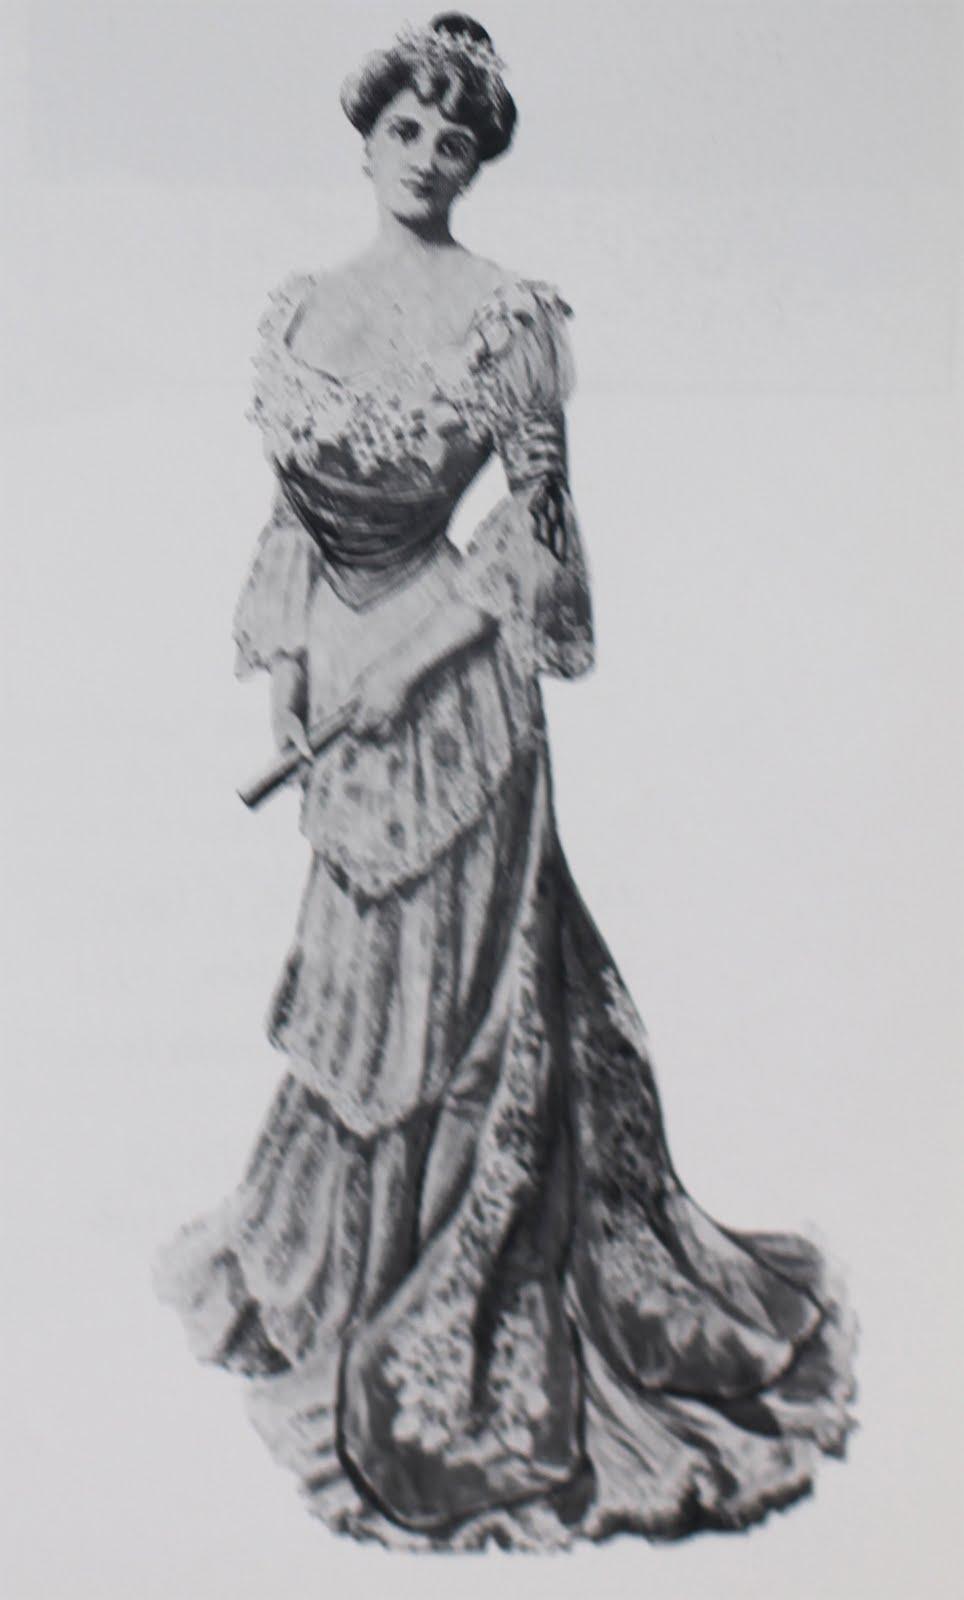 Fashion Visual Communication: 1900s In Fashion